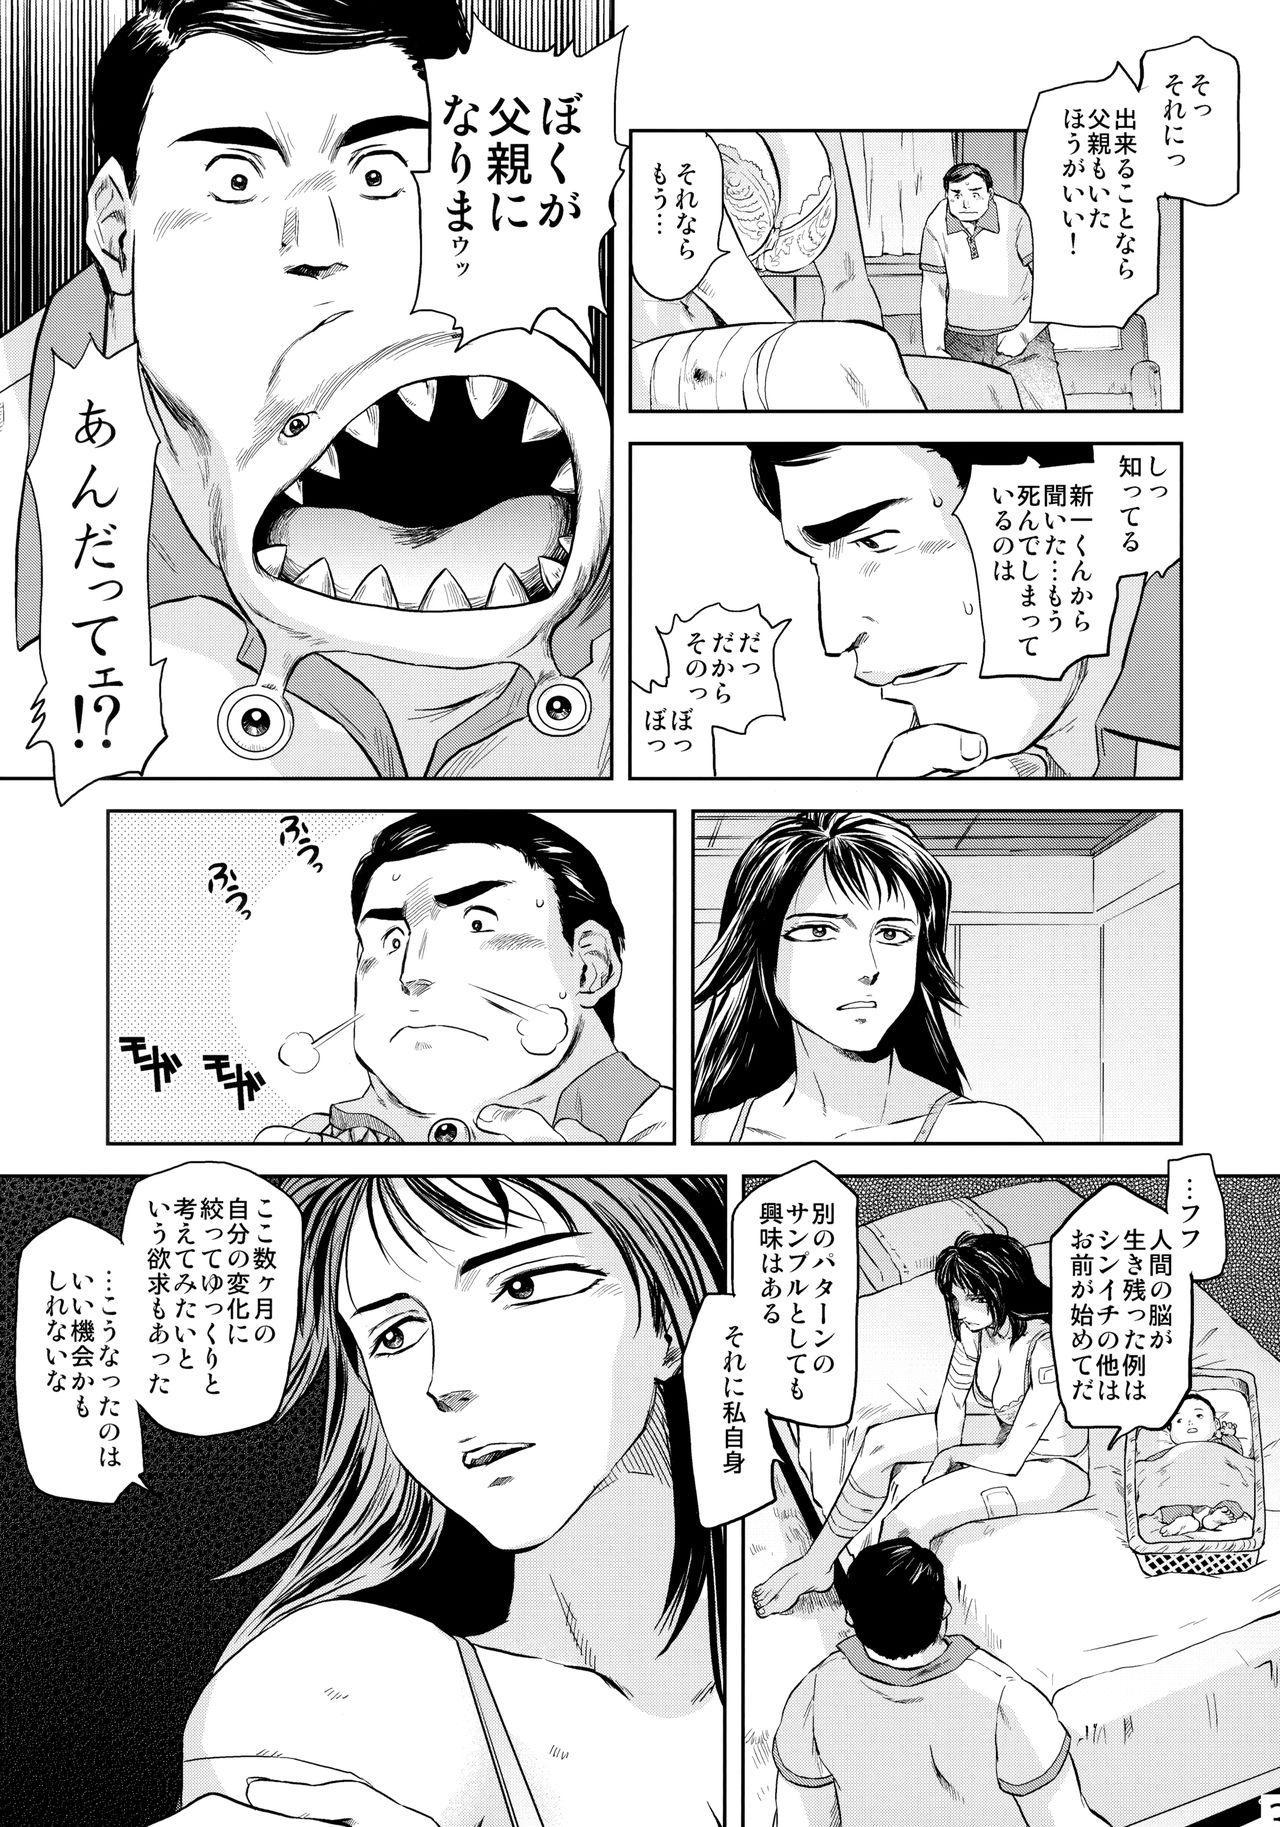 Yomeiri 35